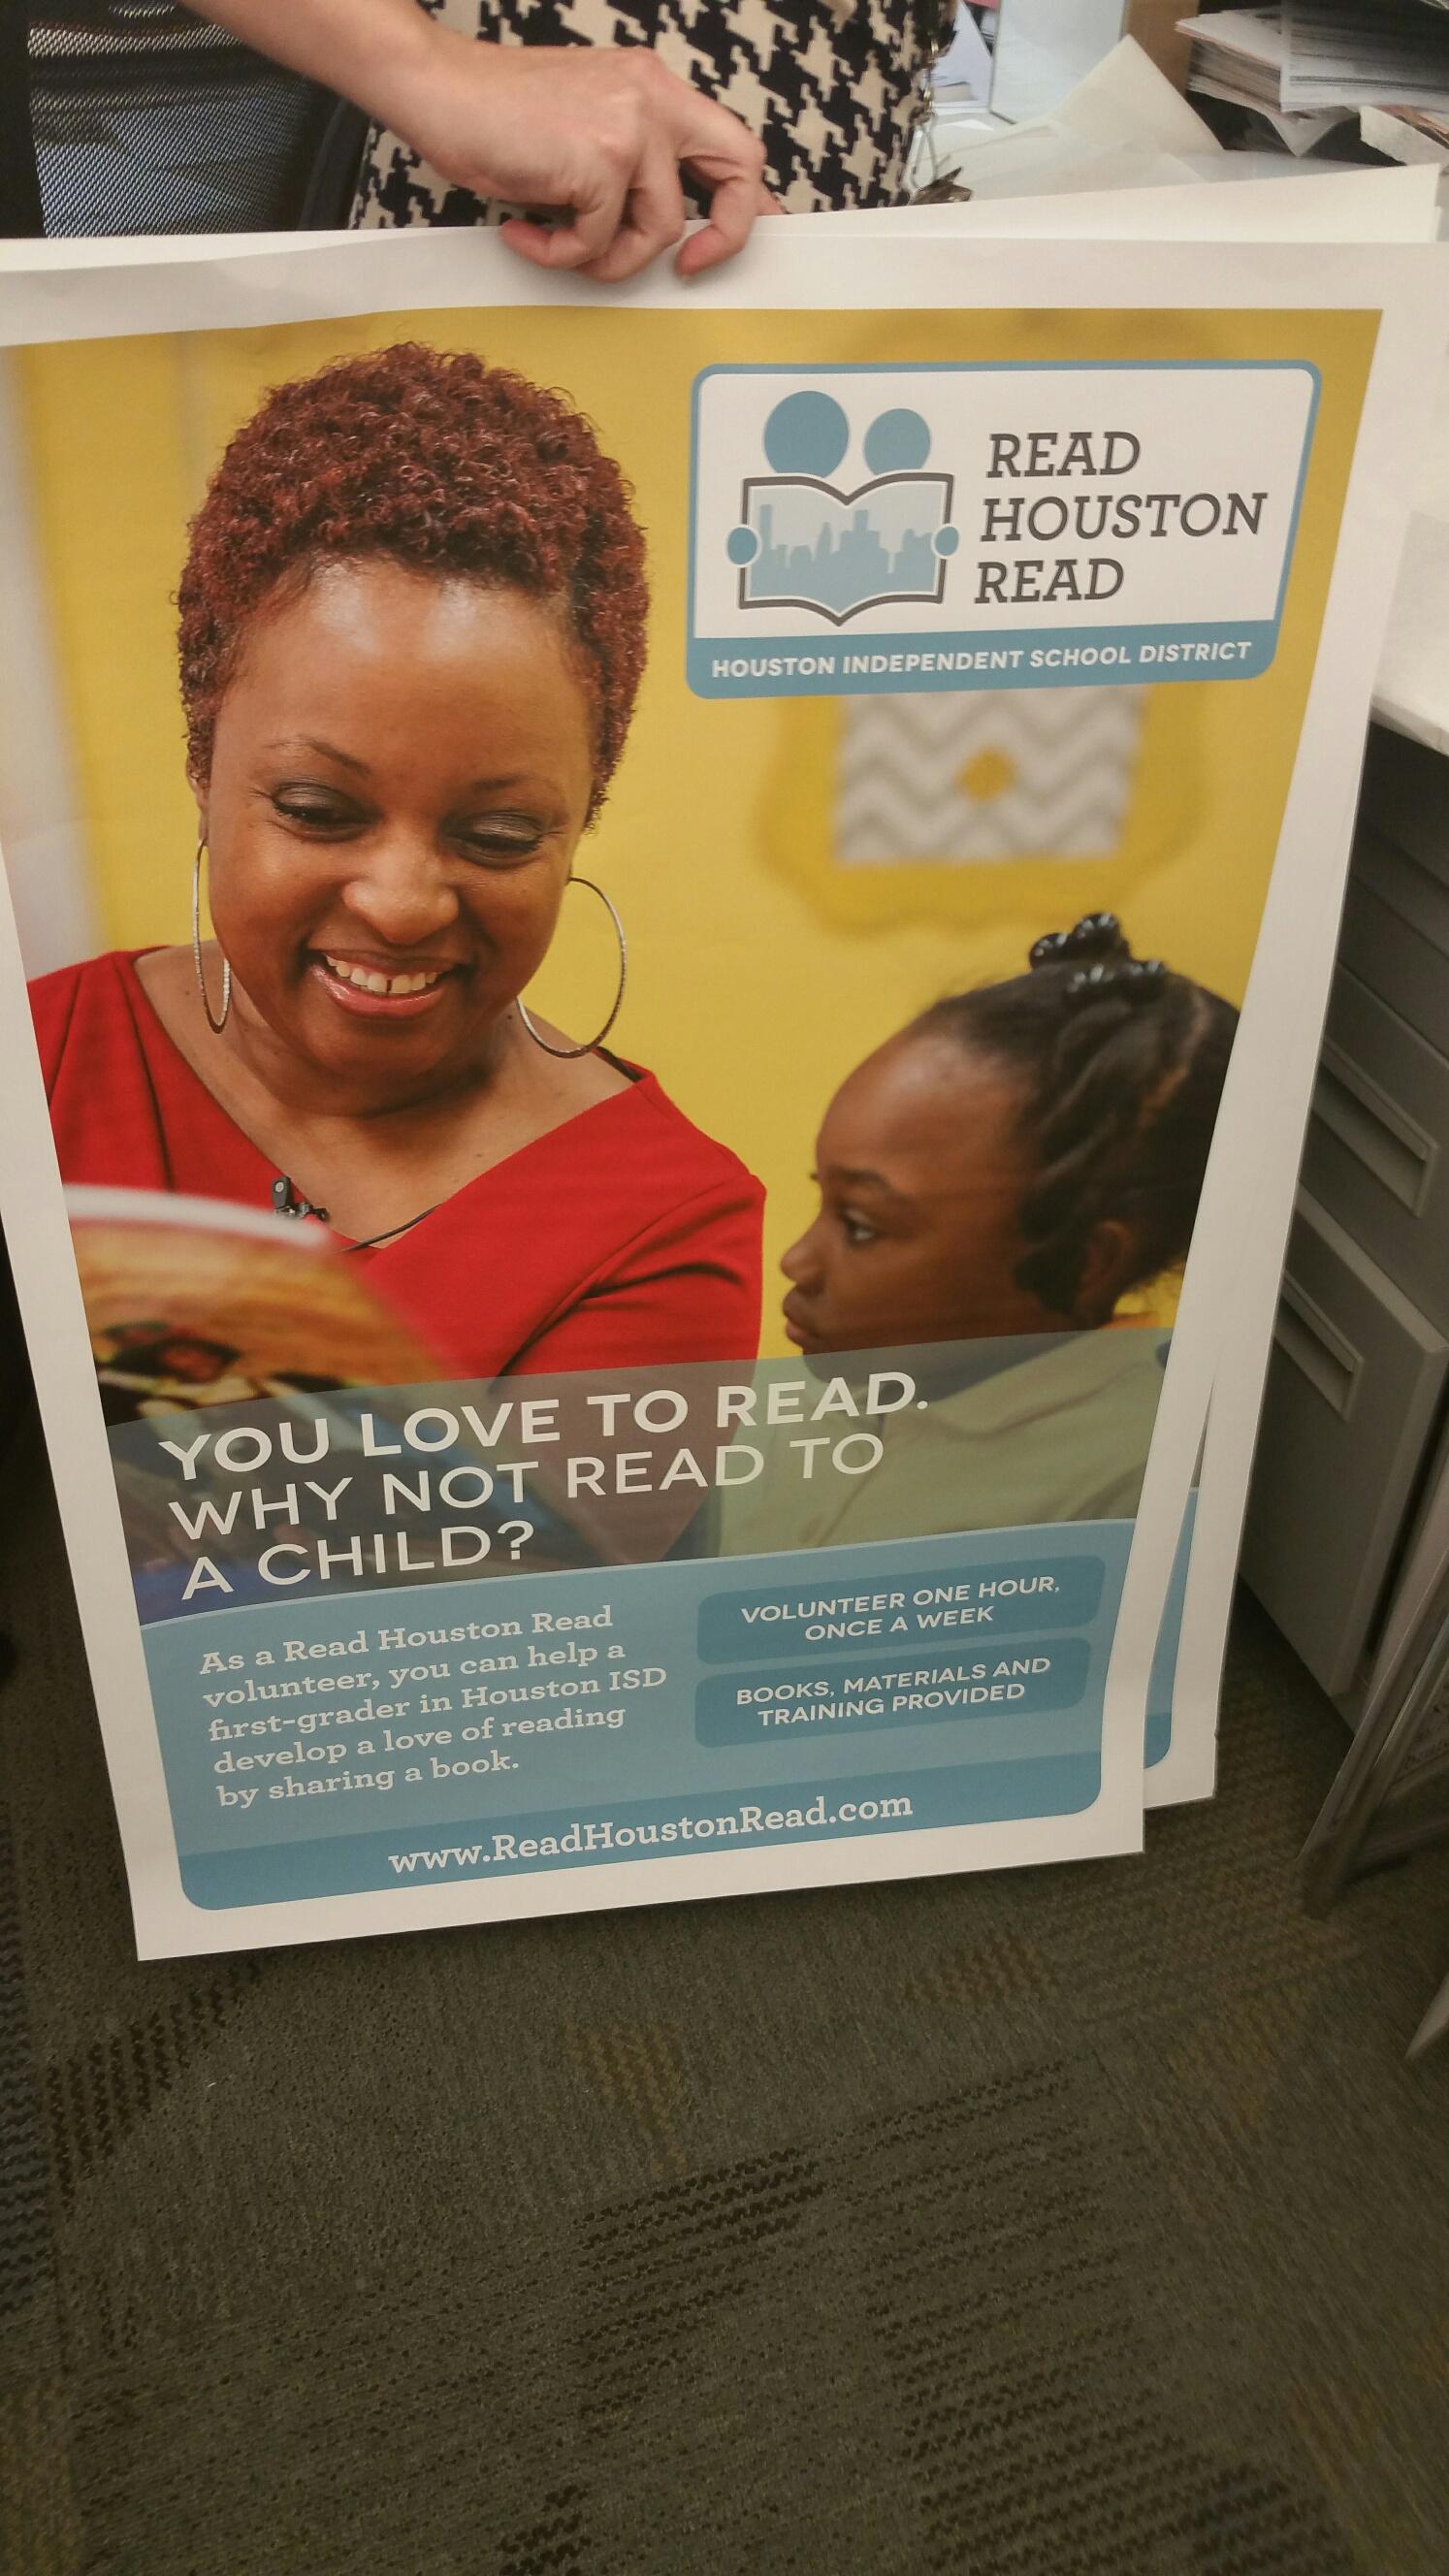 read-houston-read-poster.jpg